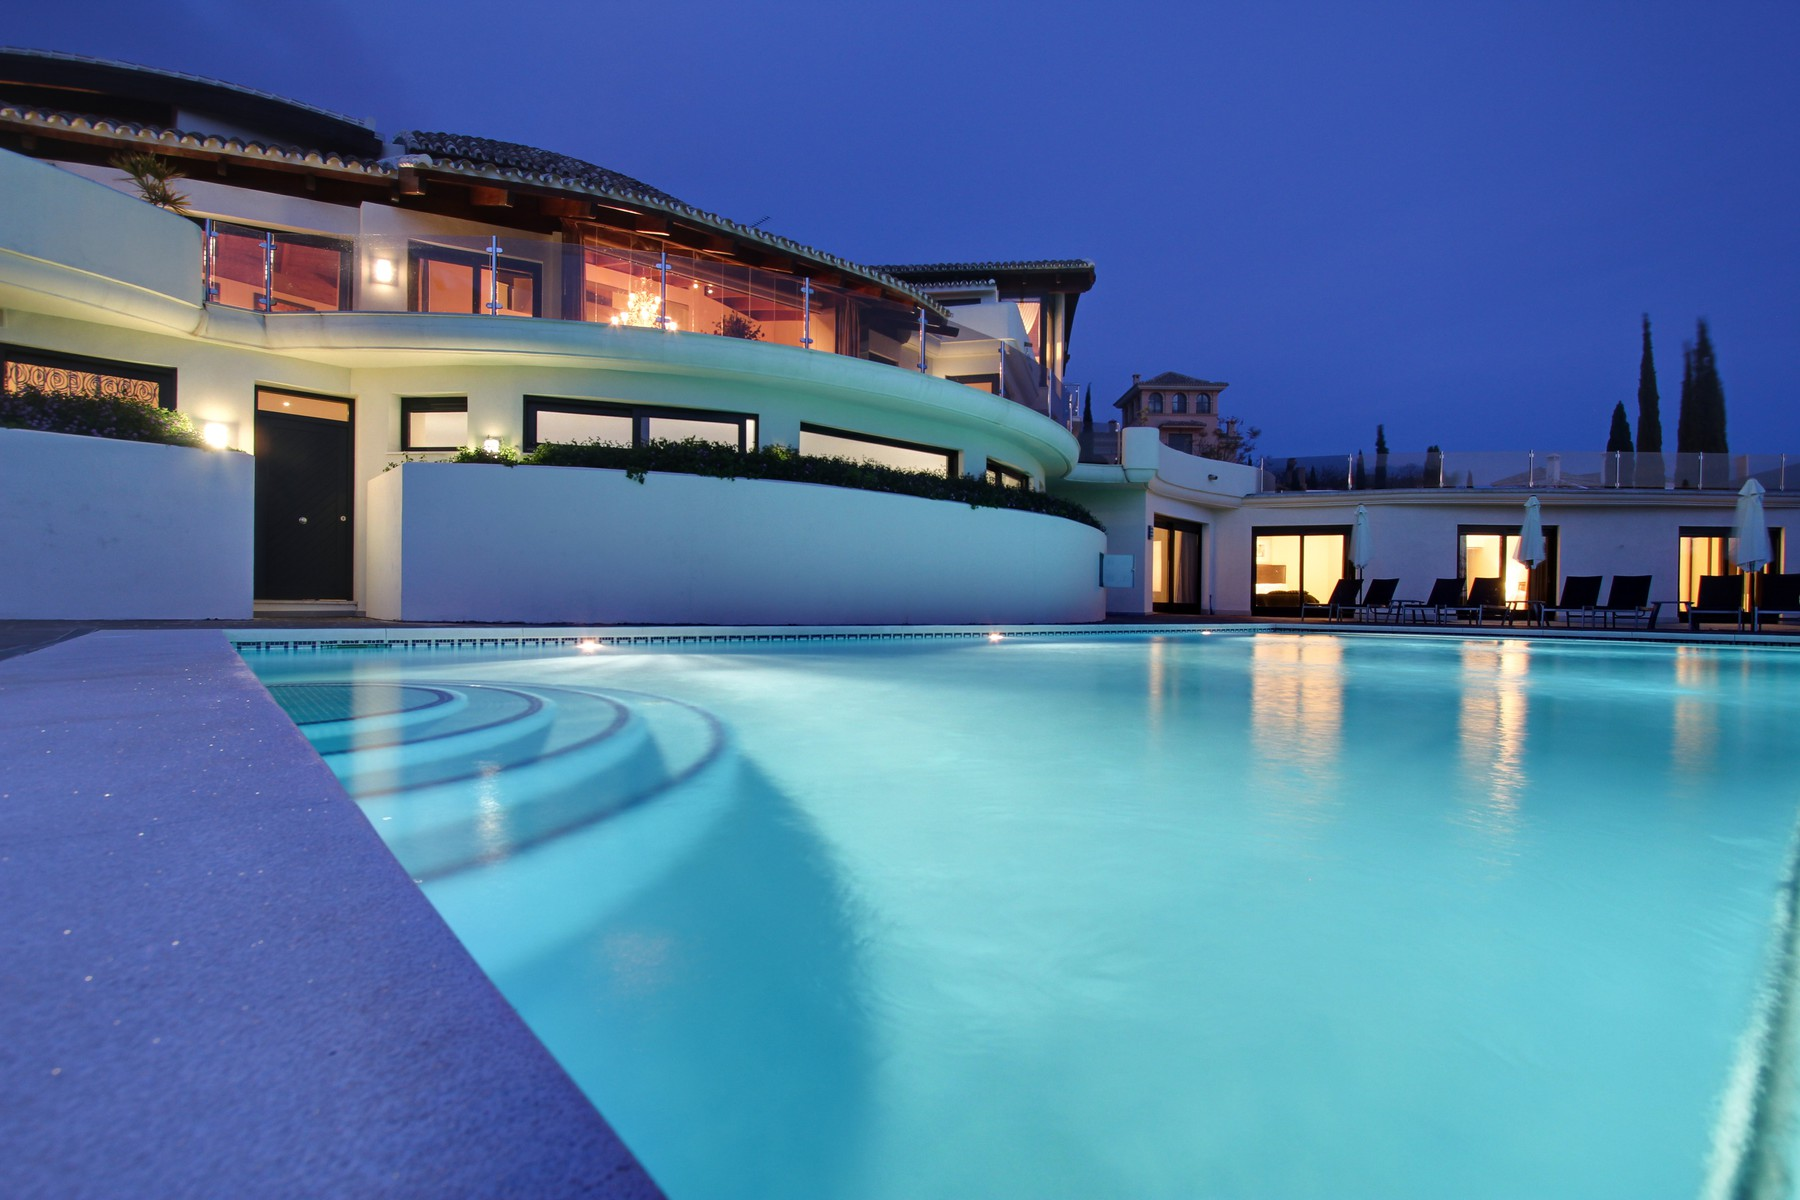 30-pool-at-dusk